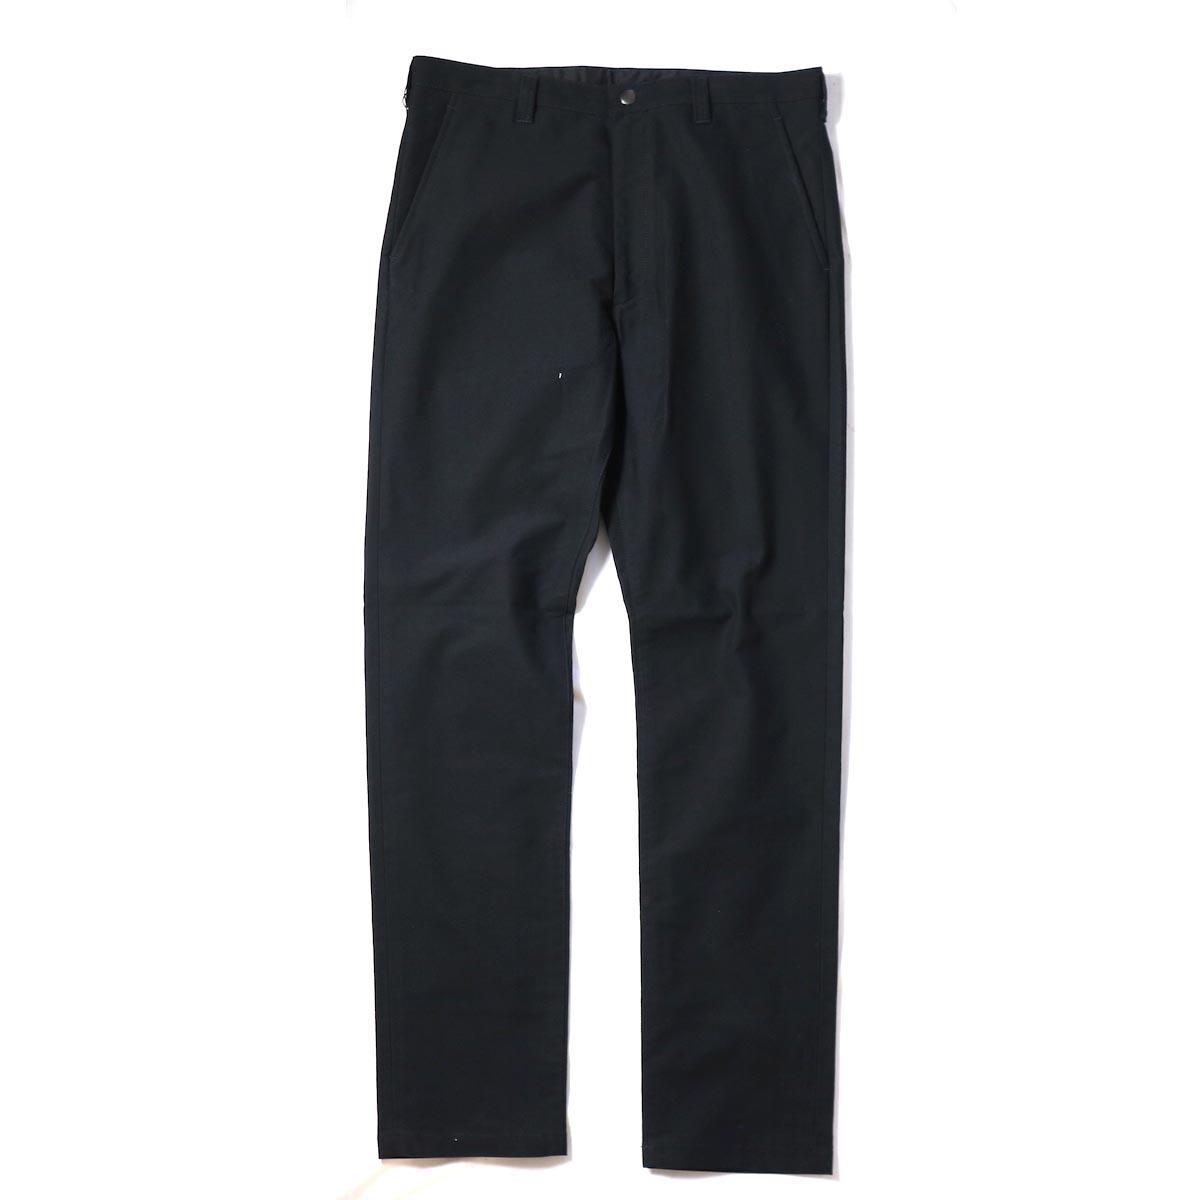 N.HOOLYWOOD / 282-CP04-029peg SLIM STRETCH PANT -Black